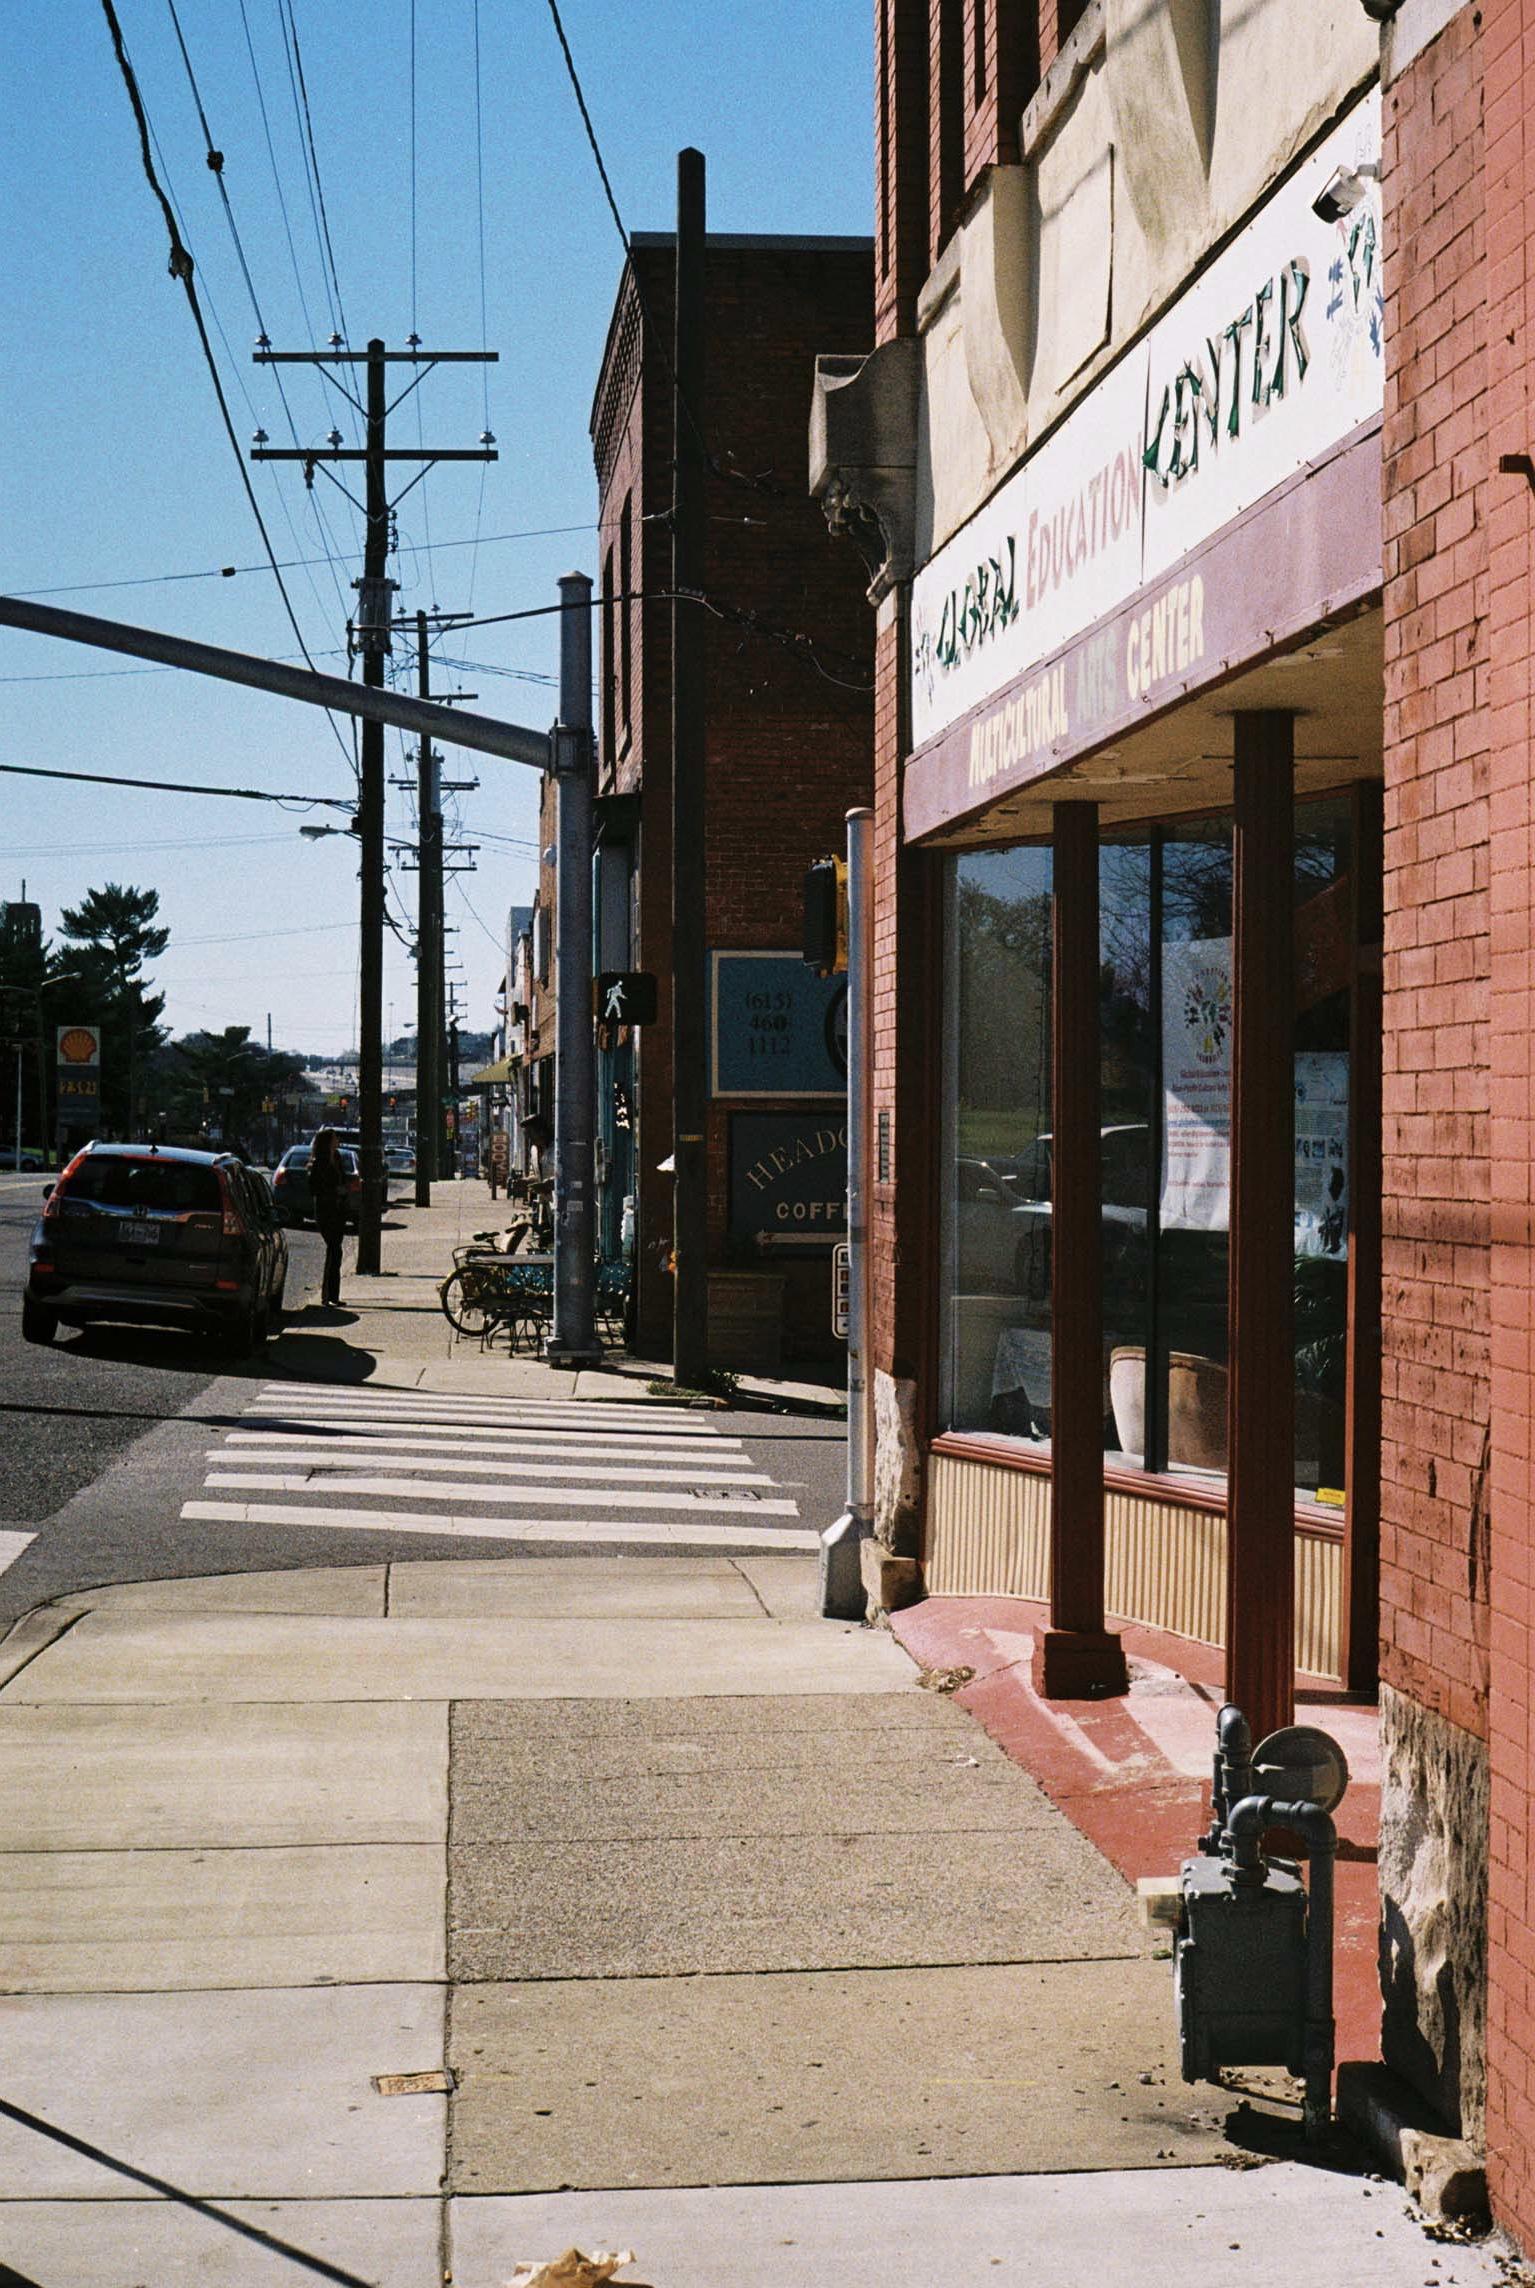 West Nashville.  Tennessee.  Kodak Ultra Max 400. Pentax K1000. Fletcher Berryman 2019.